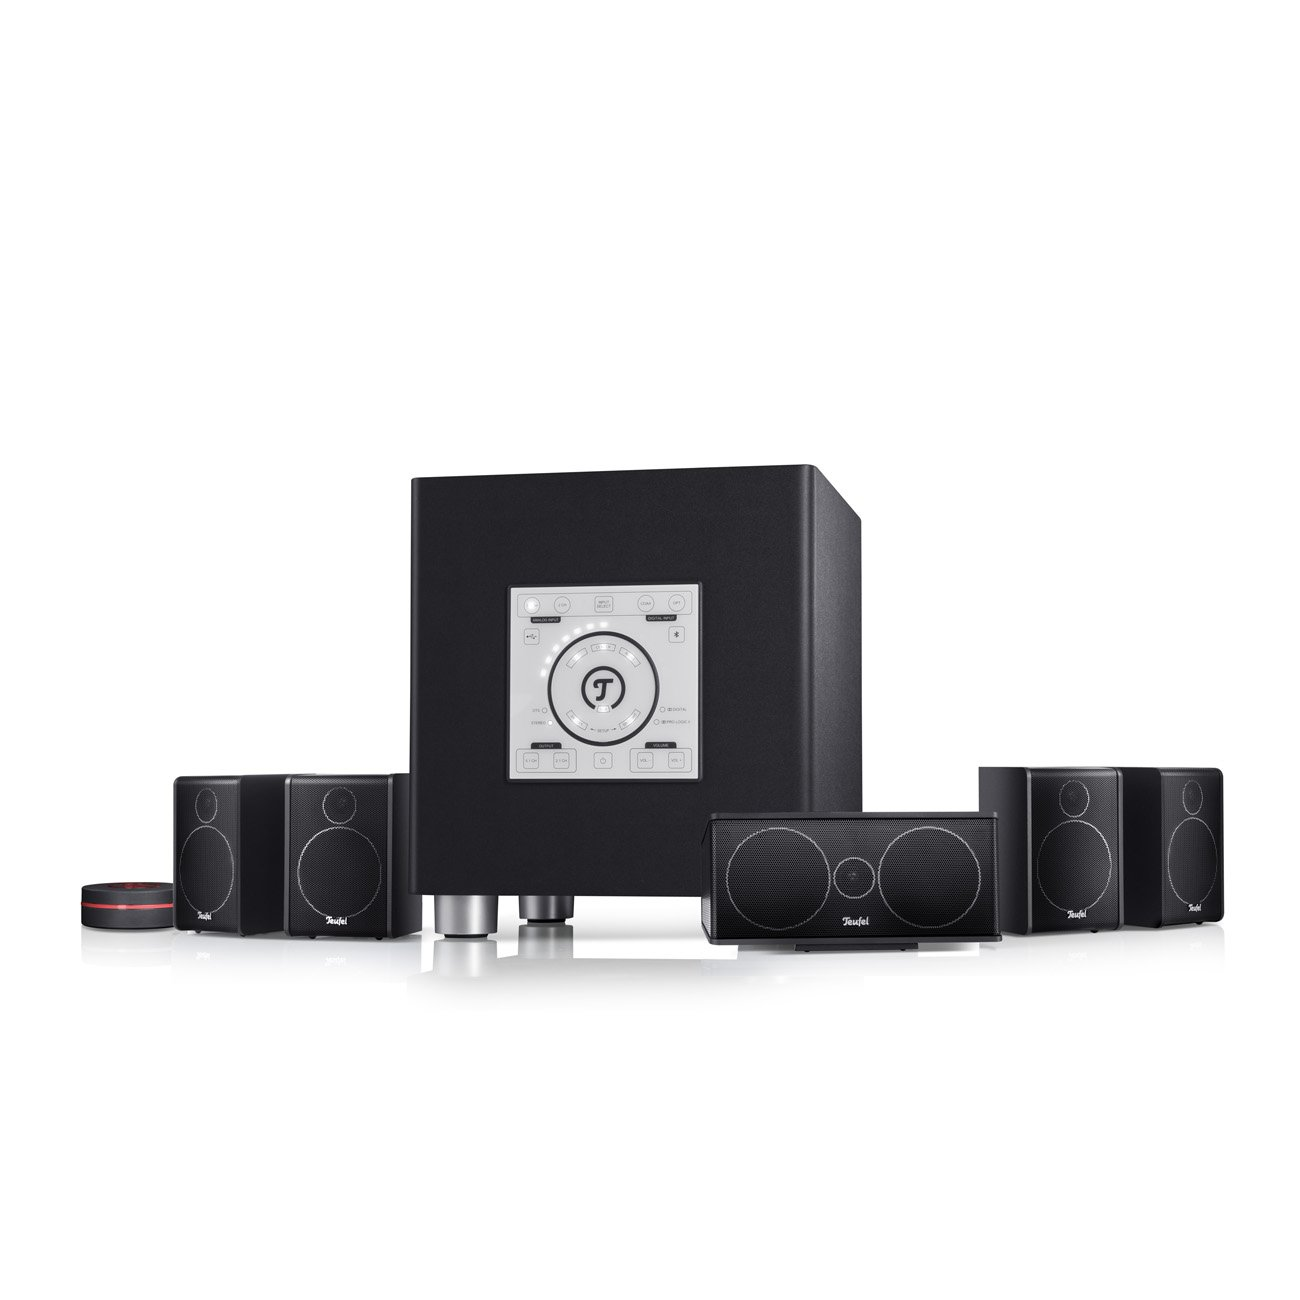 im test teufel concept e digital 5 1 lautsprecher system. Black Bedroom Furniture Sets. Home Design Ideas